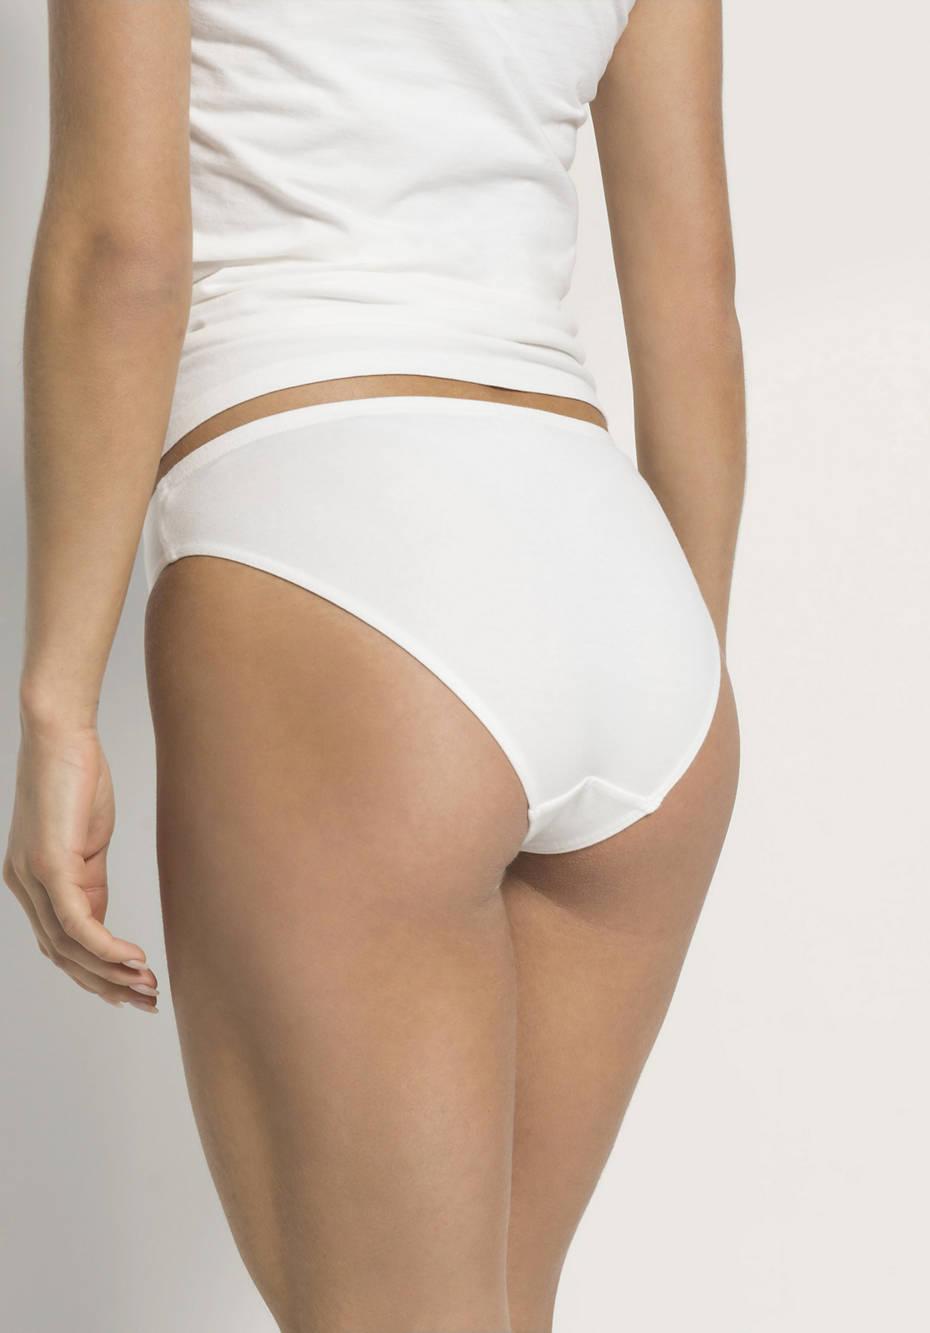 Damen Mini-Slip aus Bio-Baumwolle